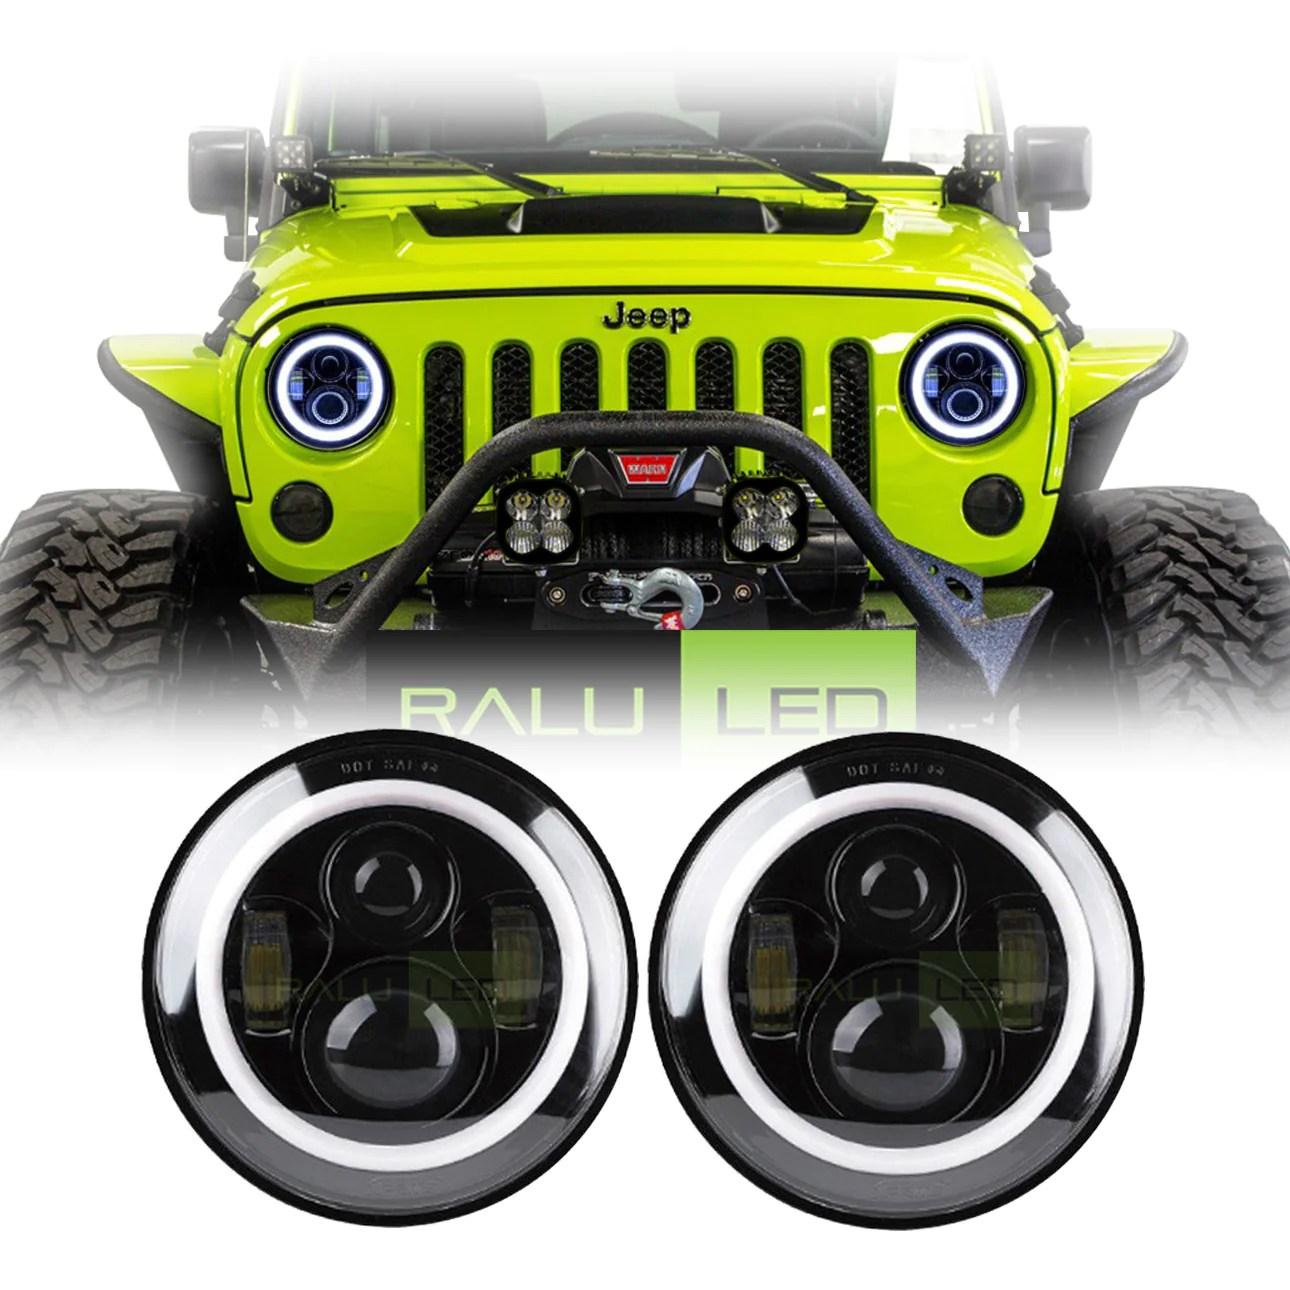 hight resolution of jeep wrangler color halo led headlights jk jku tj 1997 2018 black